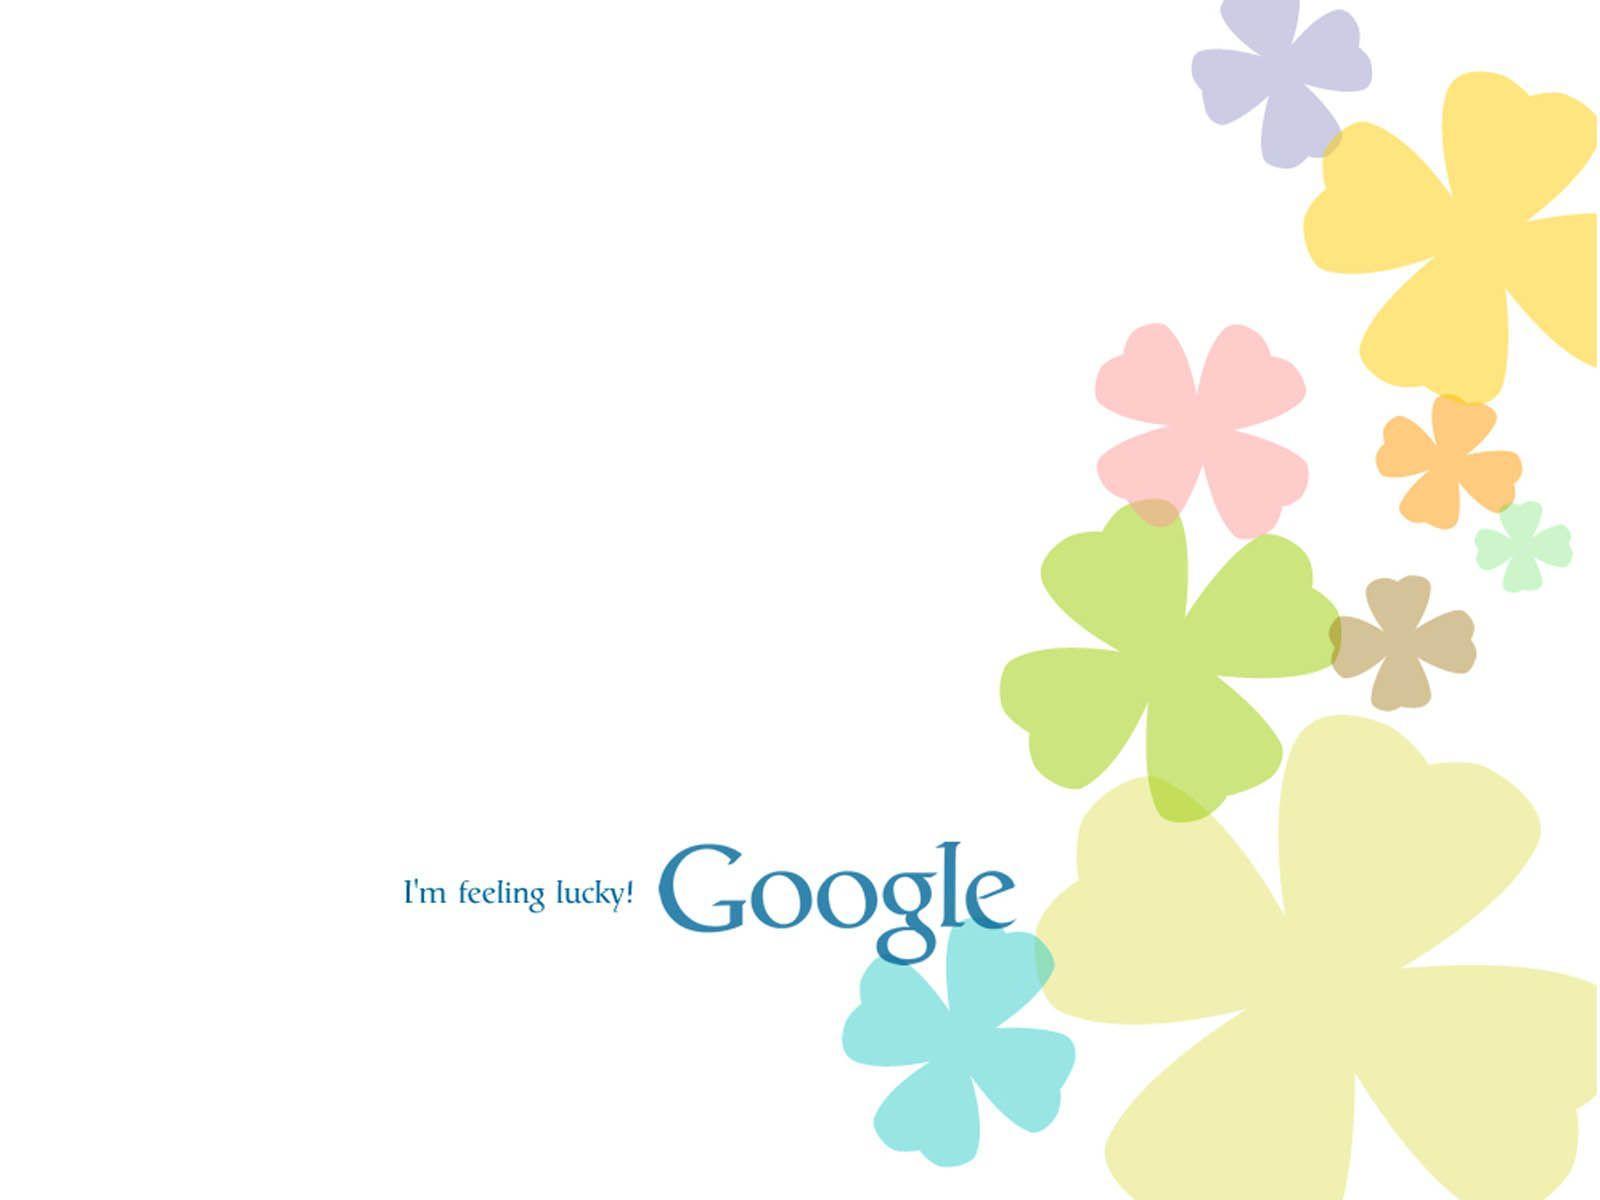 Google Free Desktop Backgrounds - Wallpaper Cave